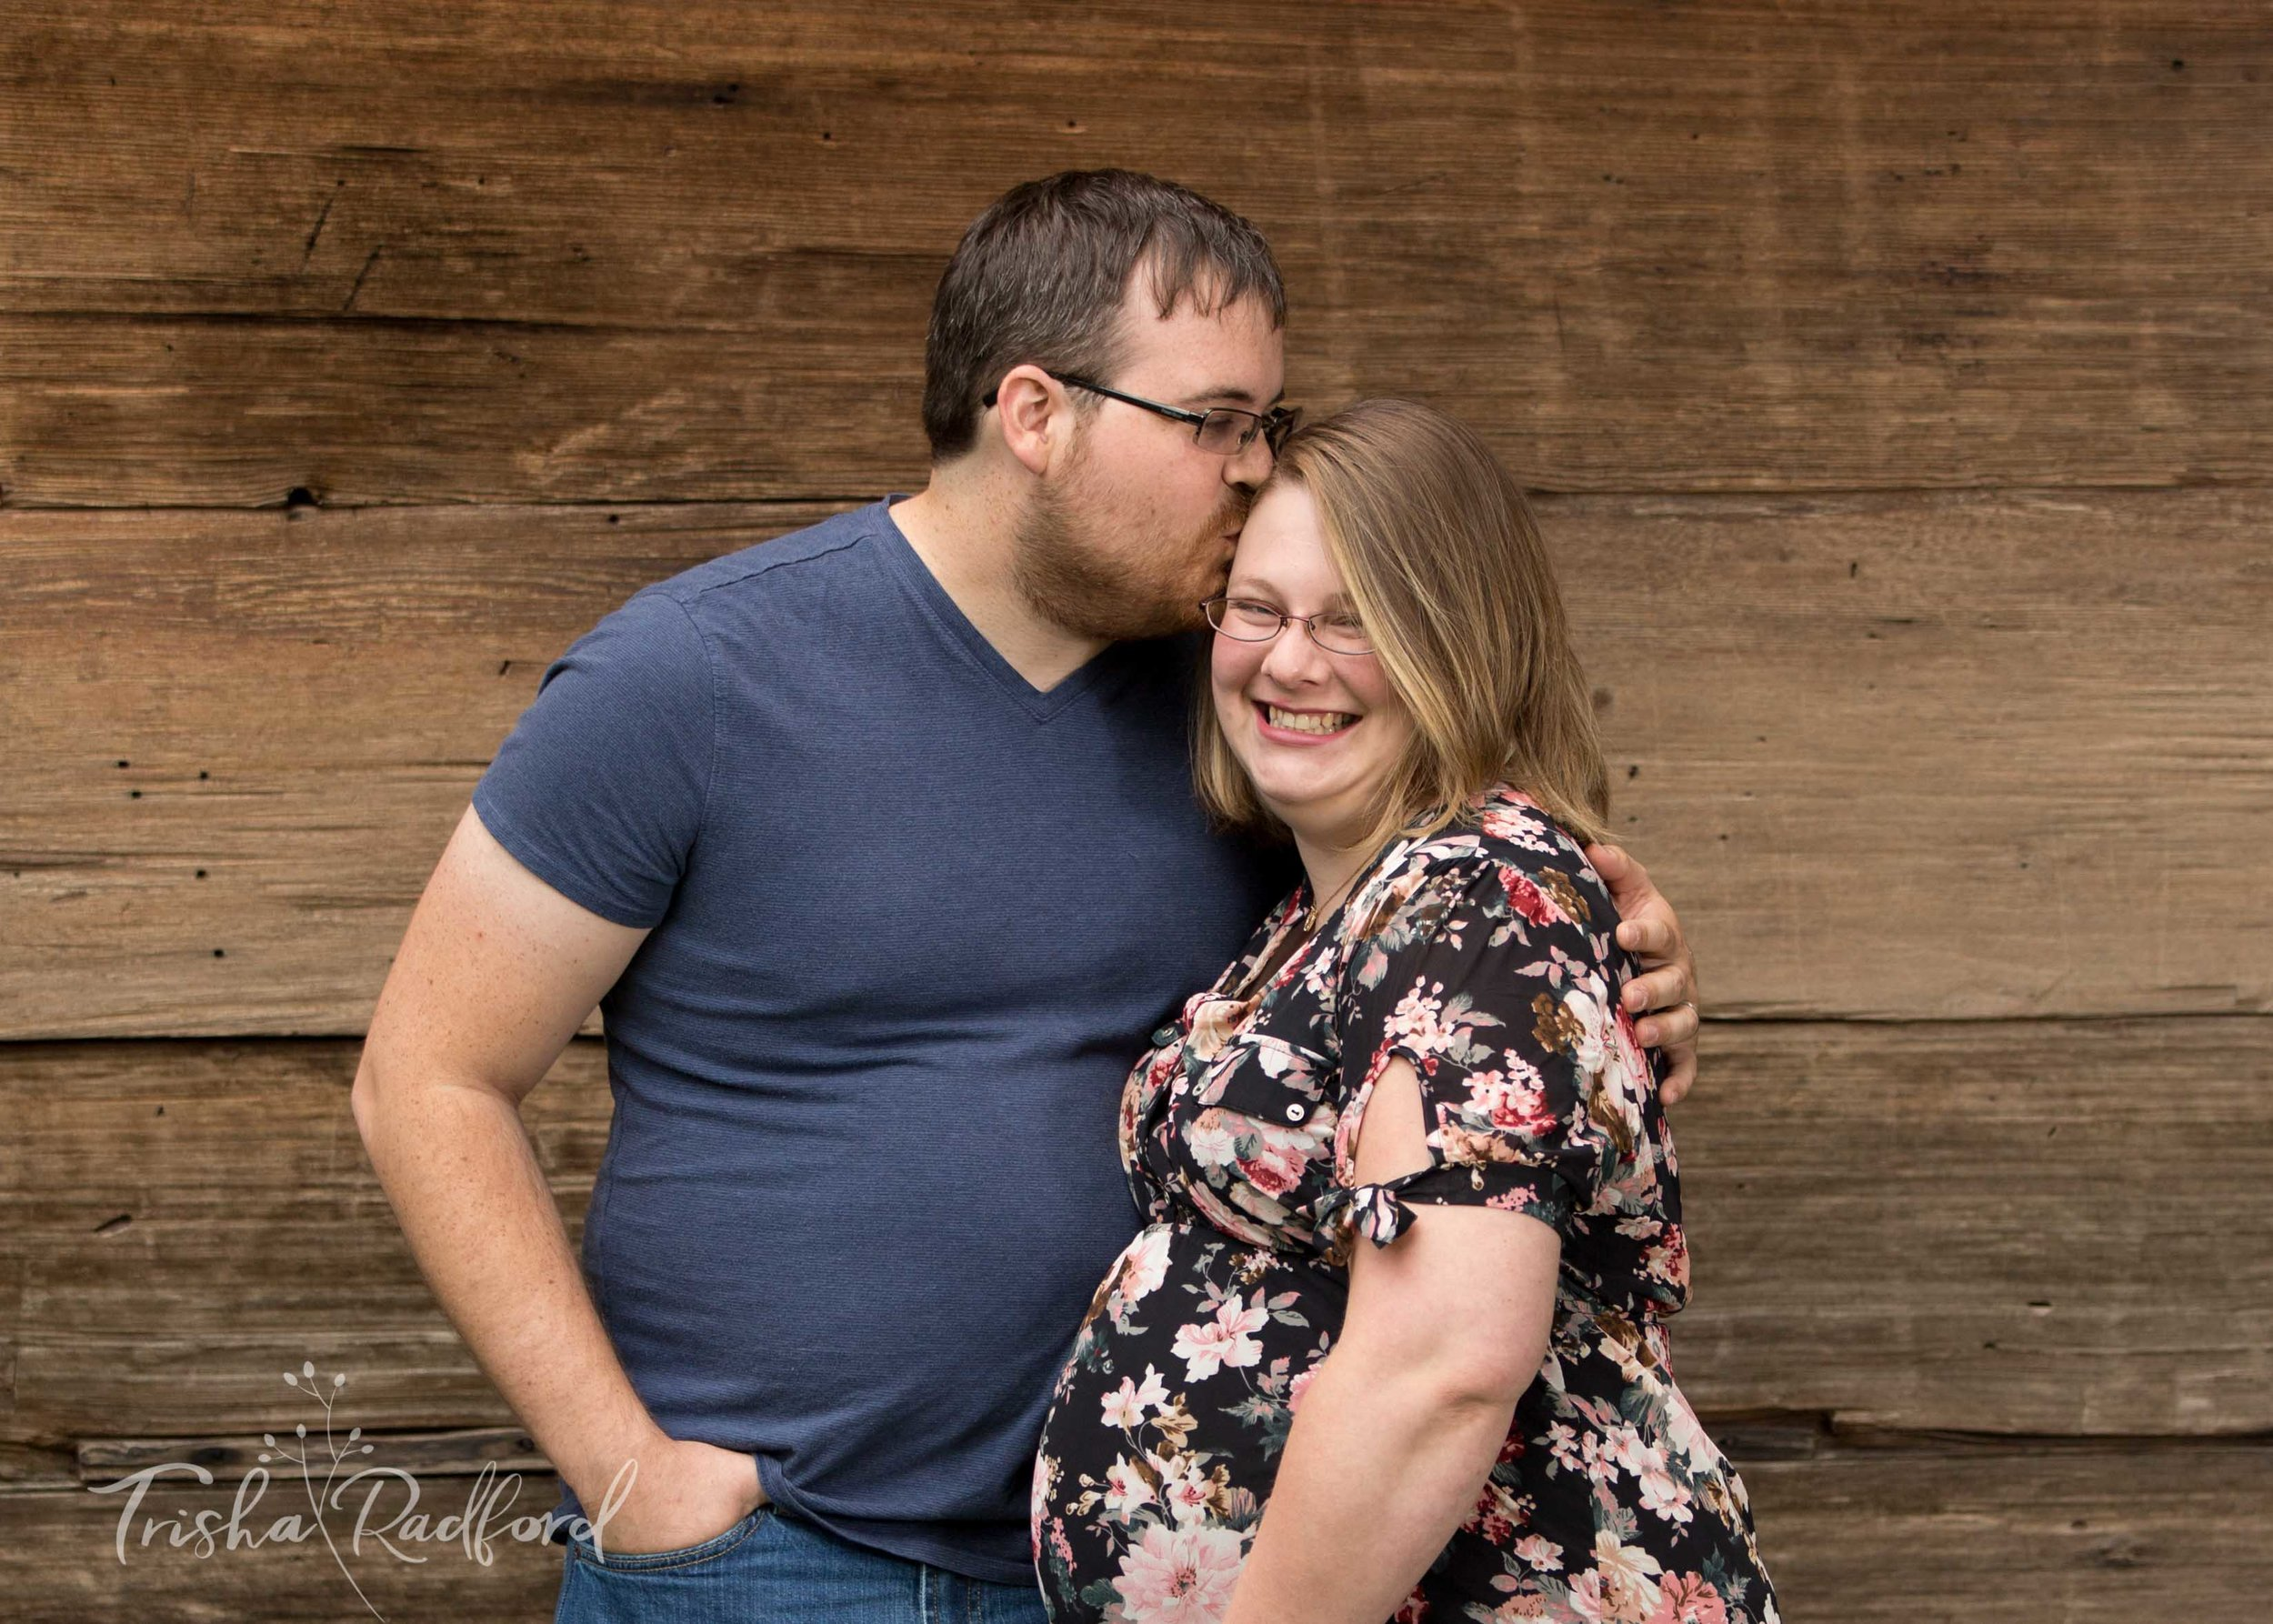 Snohomish County Photographer | Maternity Photoshoot | Jennings Park, Marysville WA